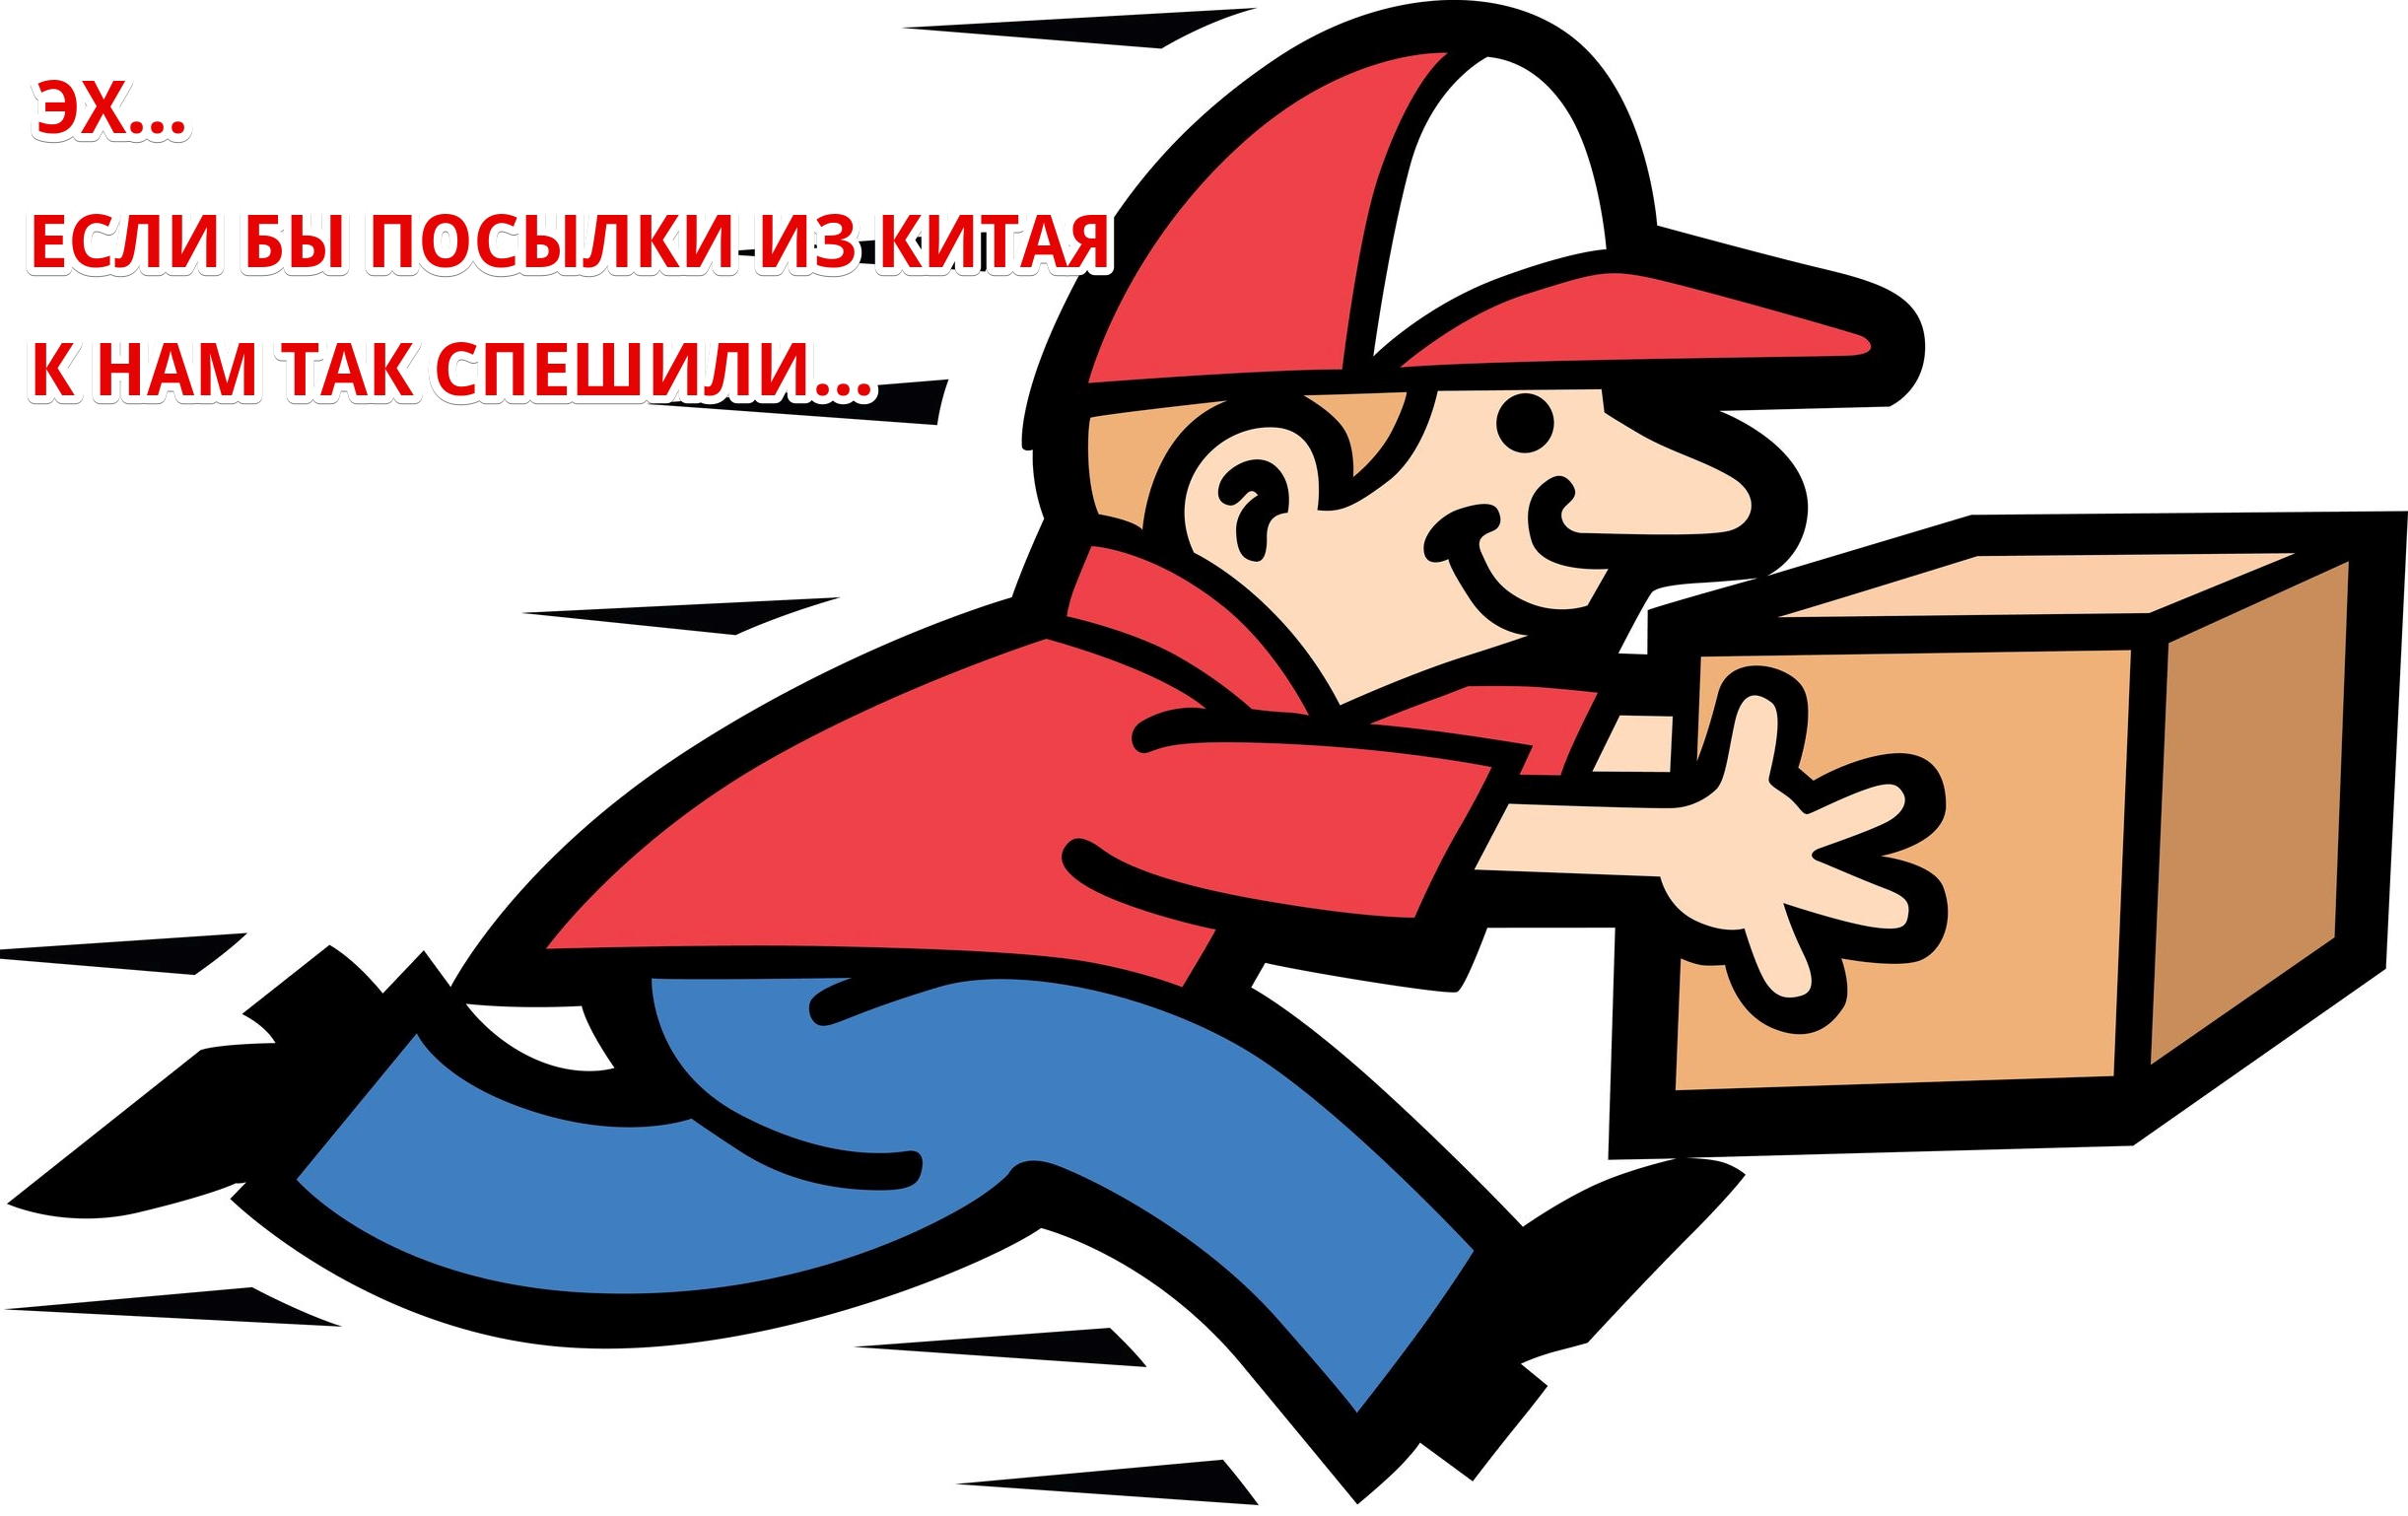 ru express доставка gerbest отслеживание